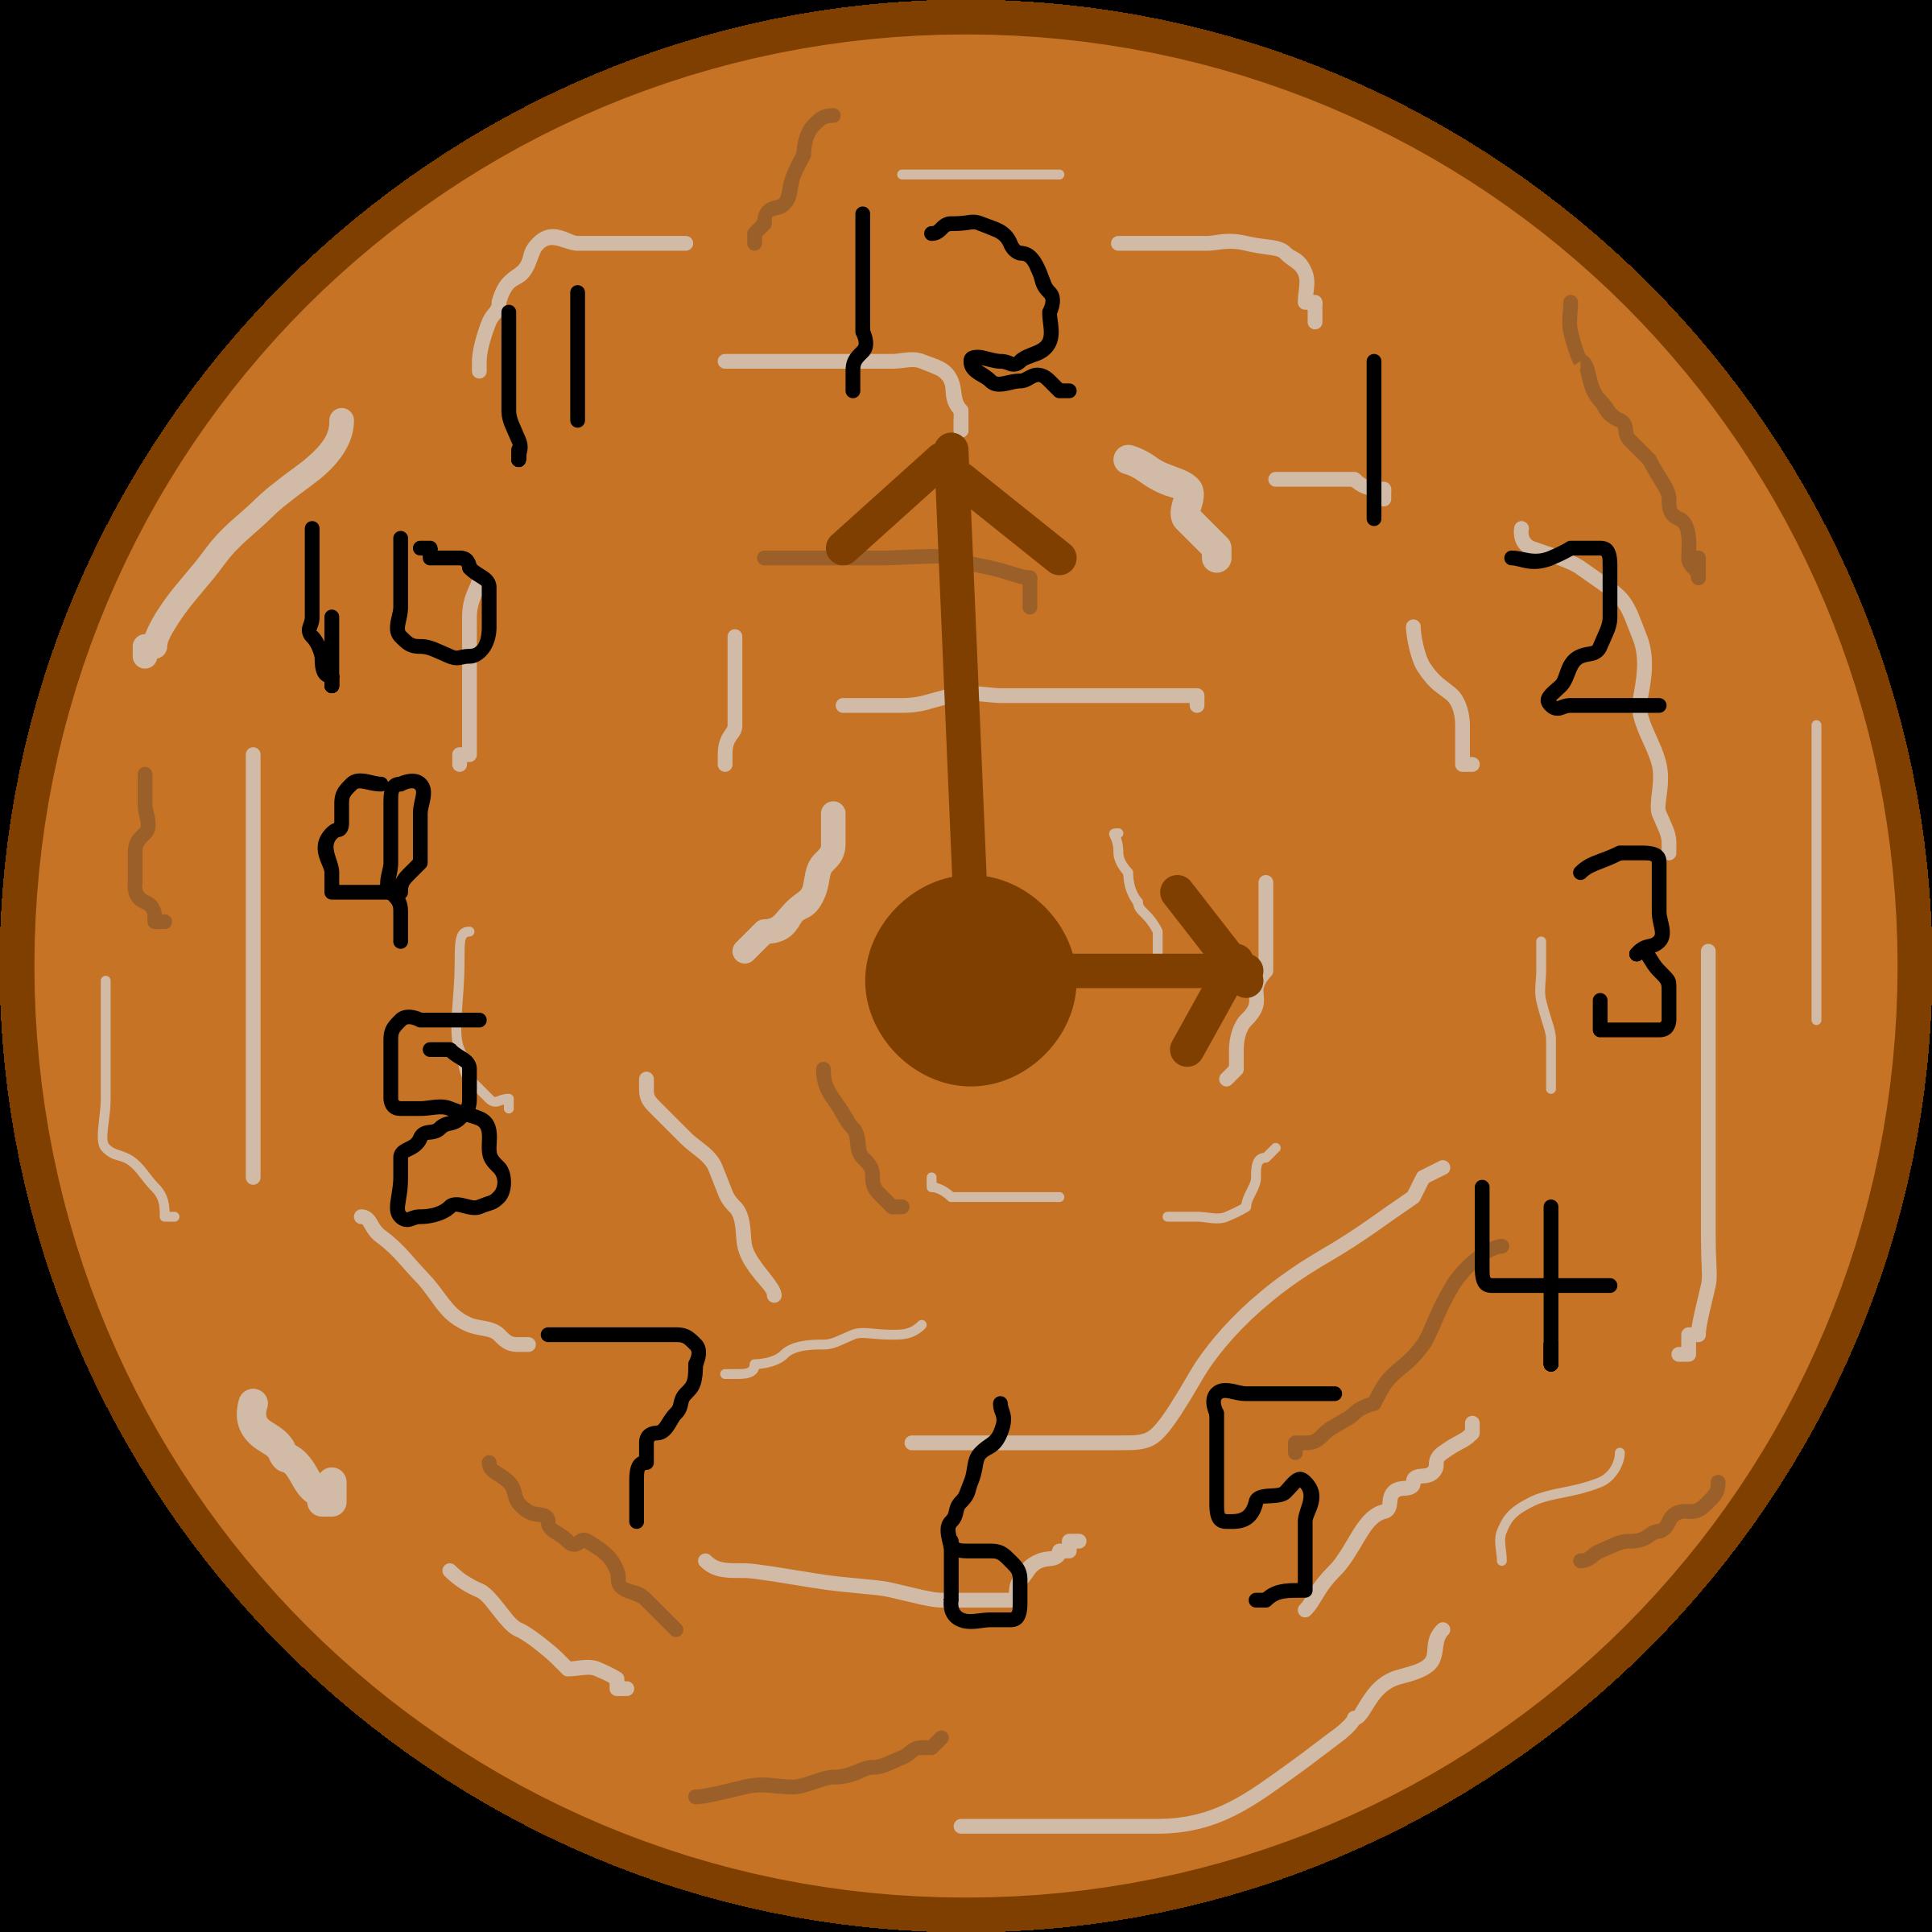 Donut clipart svg. Doughnut or cookies clock